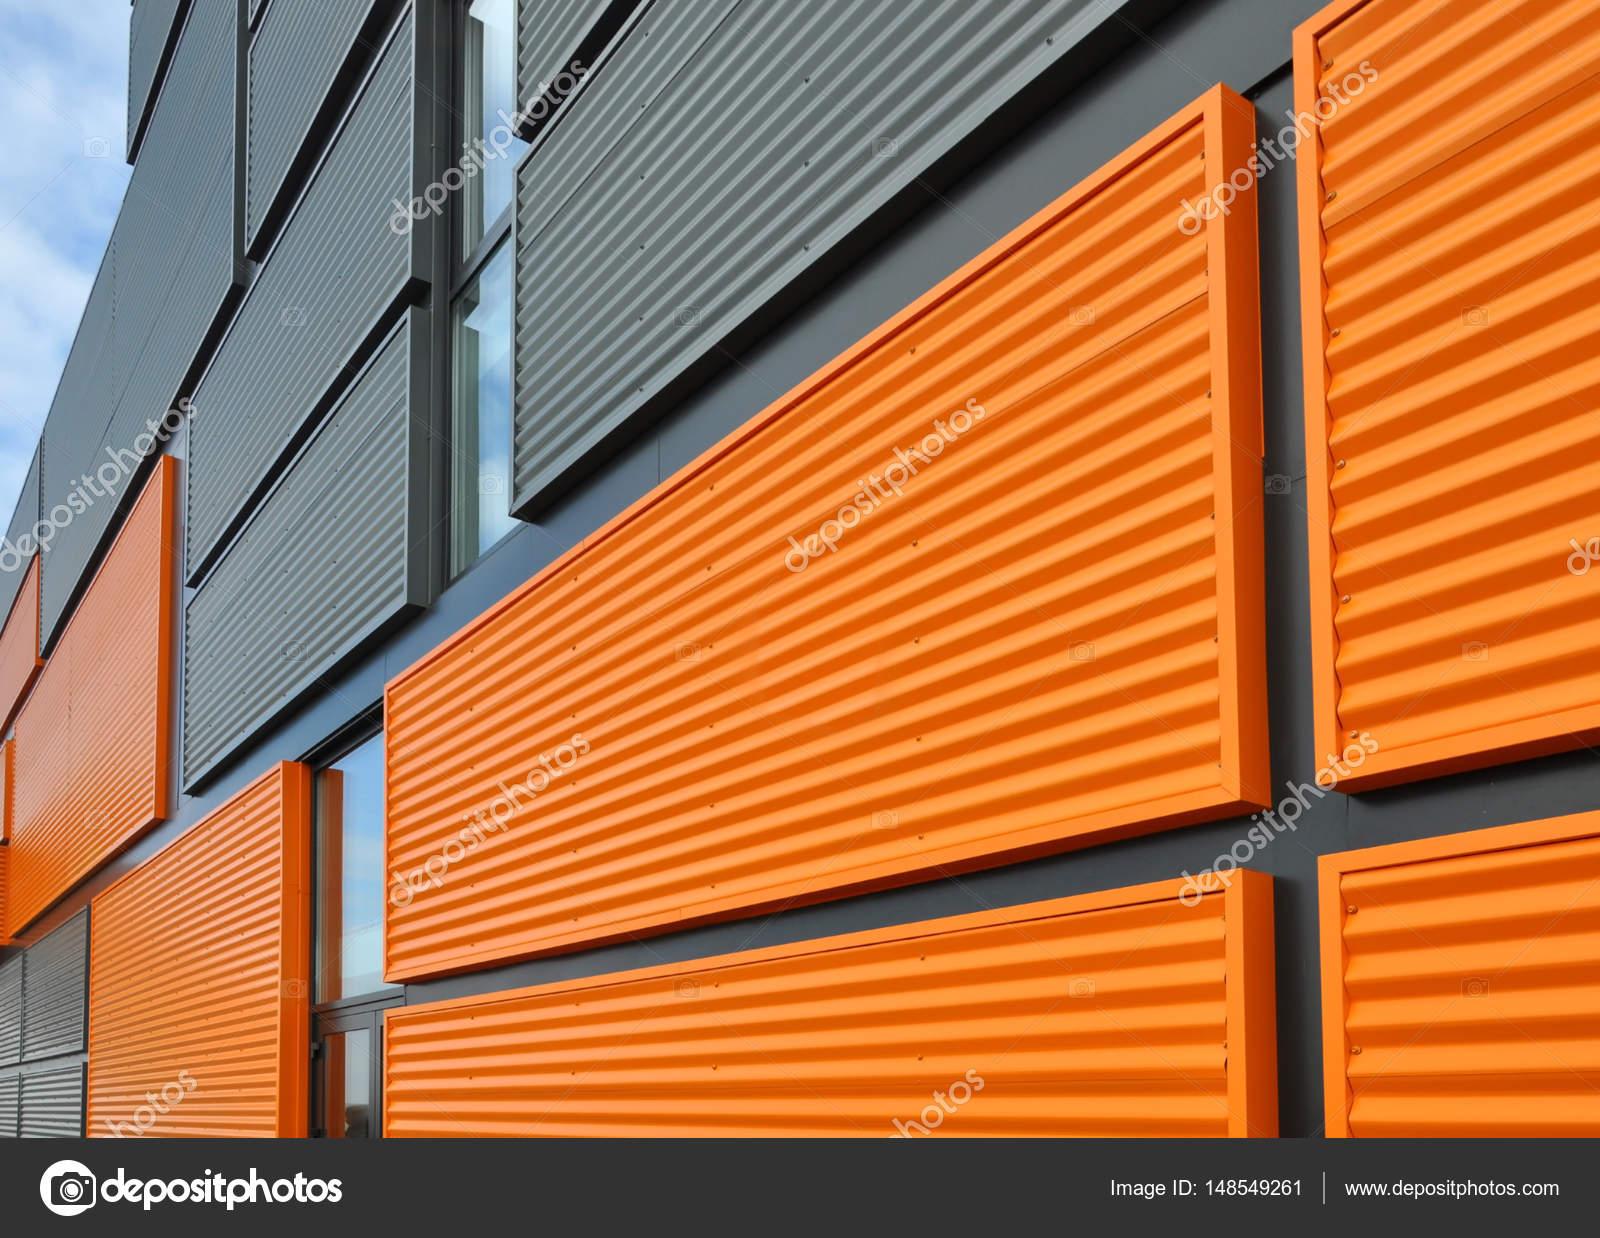 Famosos Fachada de painel laranja e preto — Stock Photo © struvictory  HS24